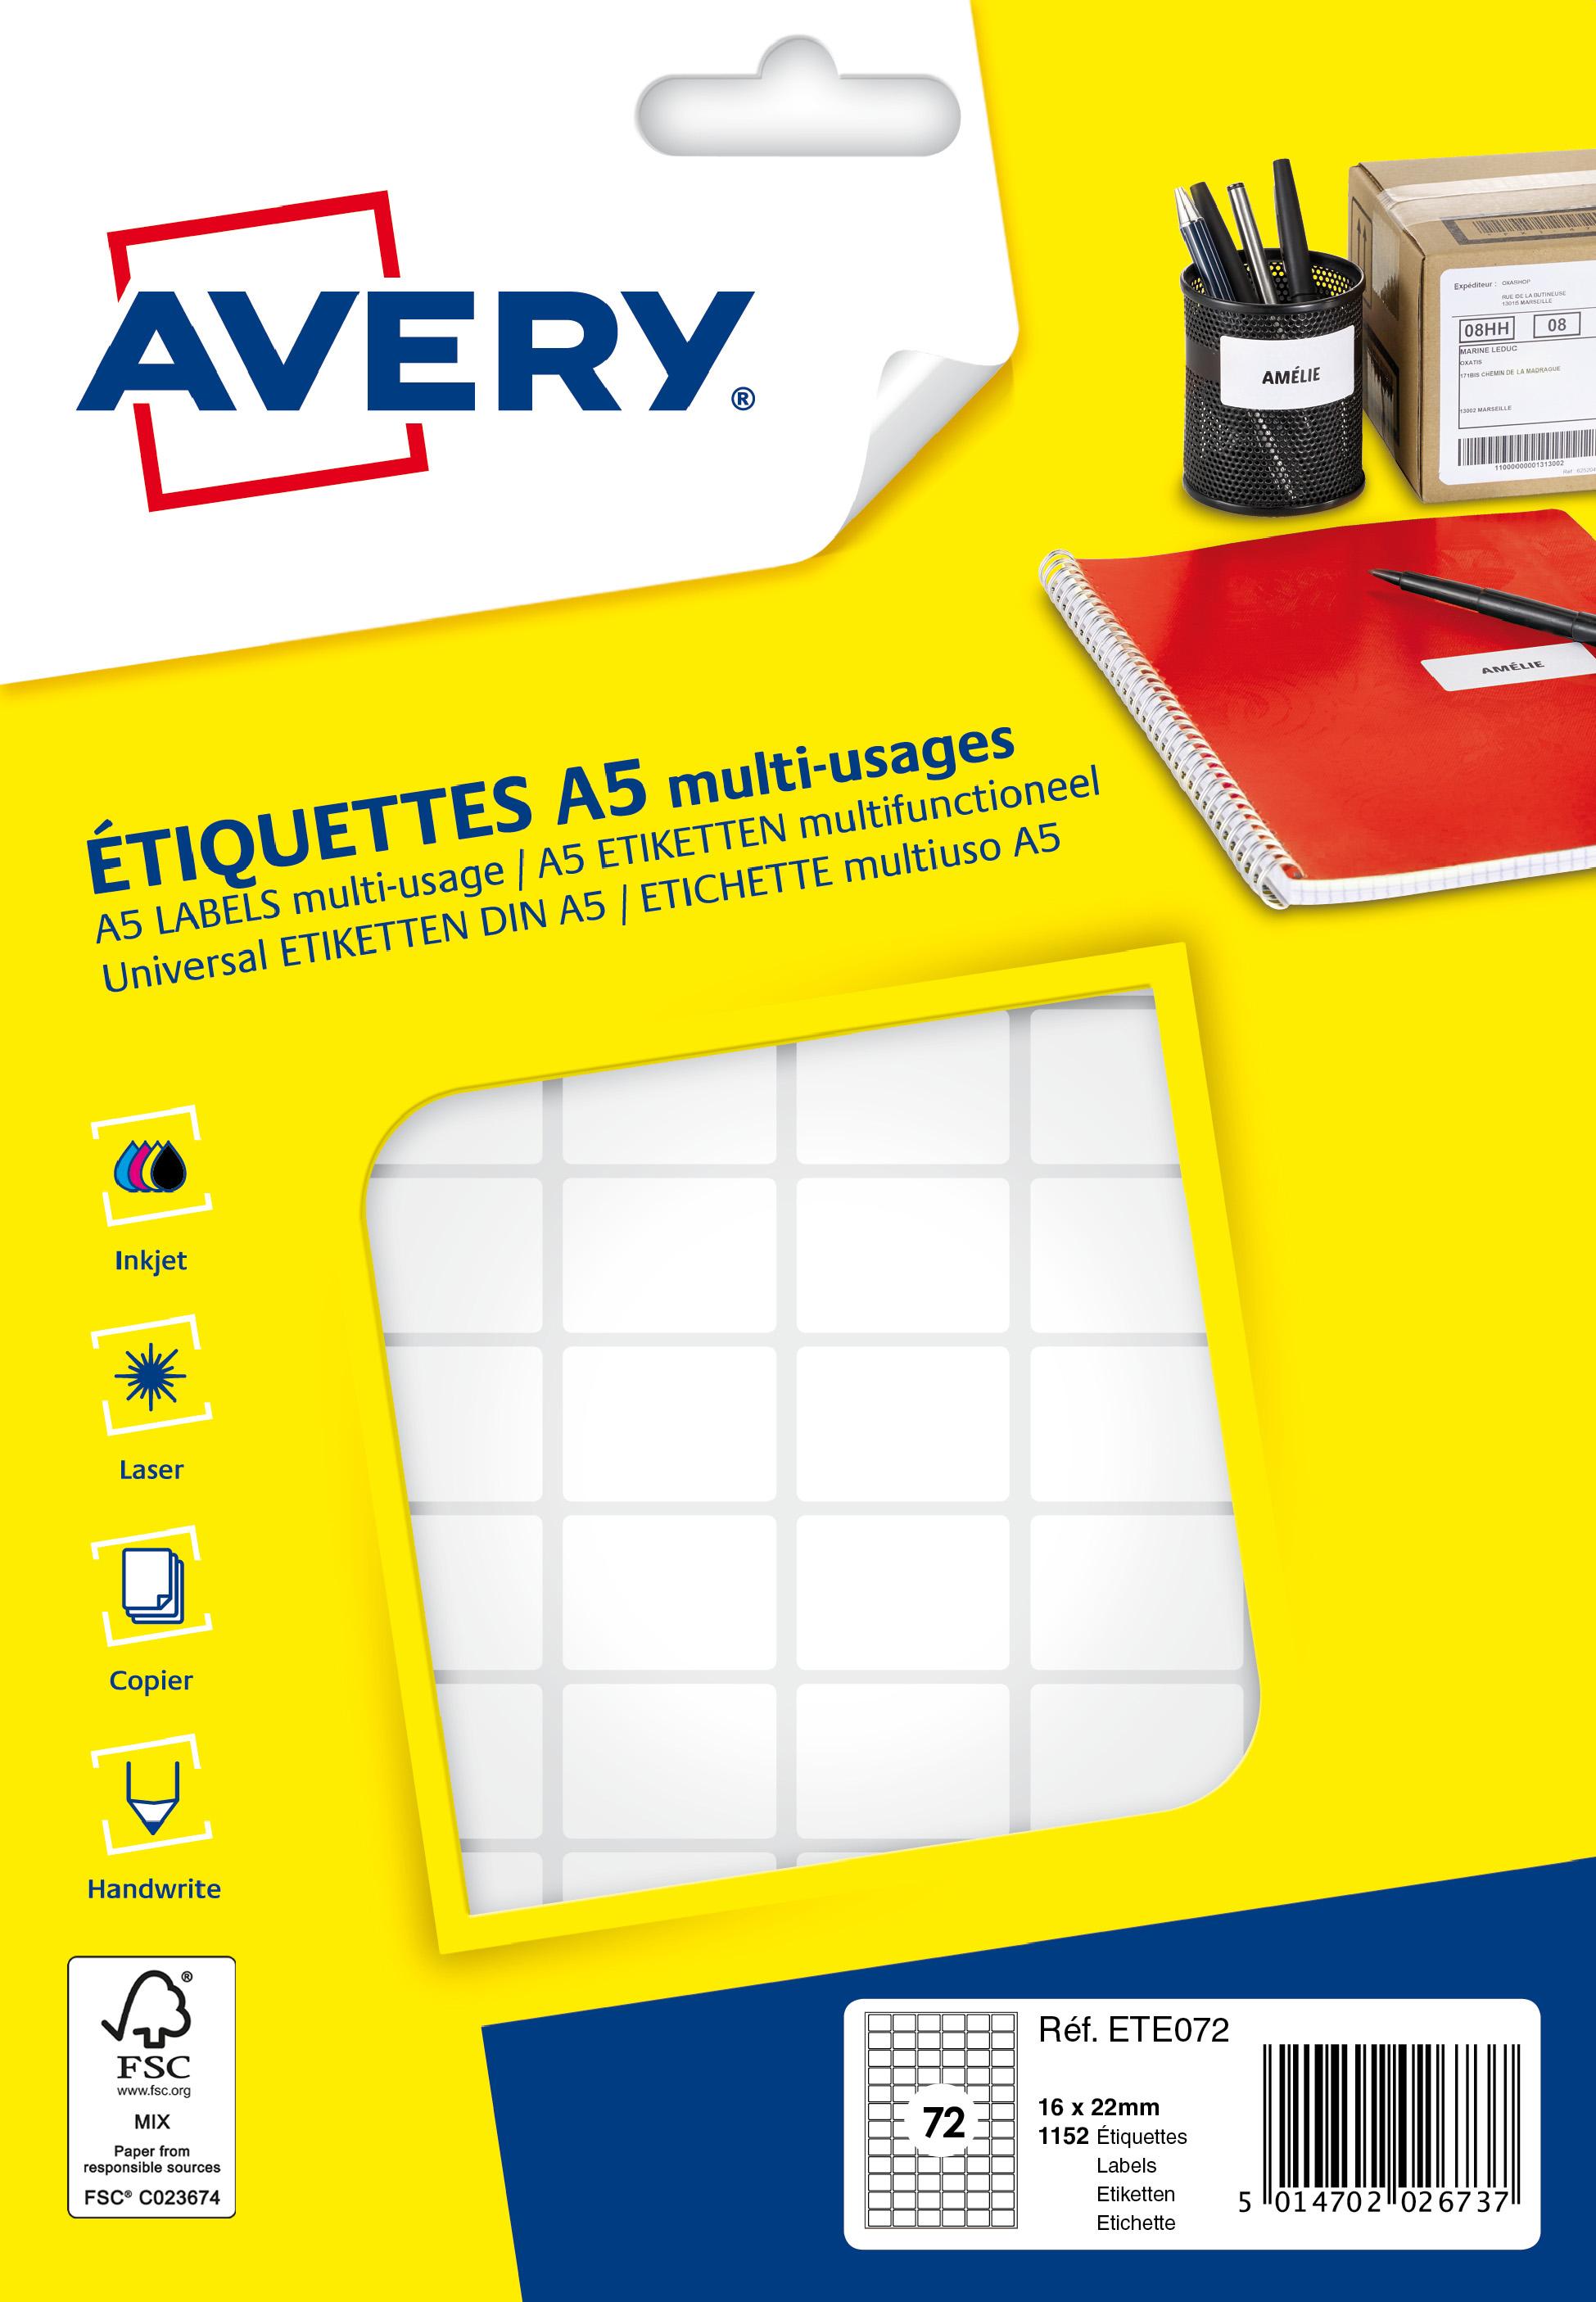 Avery - Etui A5 - 1152 Étiquettes multi-usages blanches - 16 x 22 mm - réf ETE072